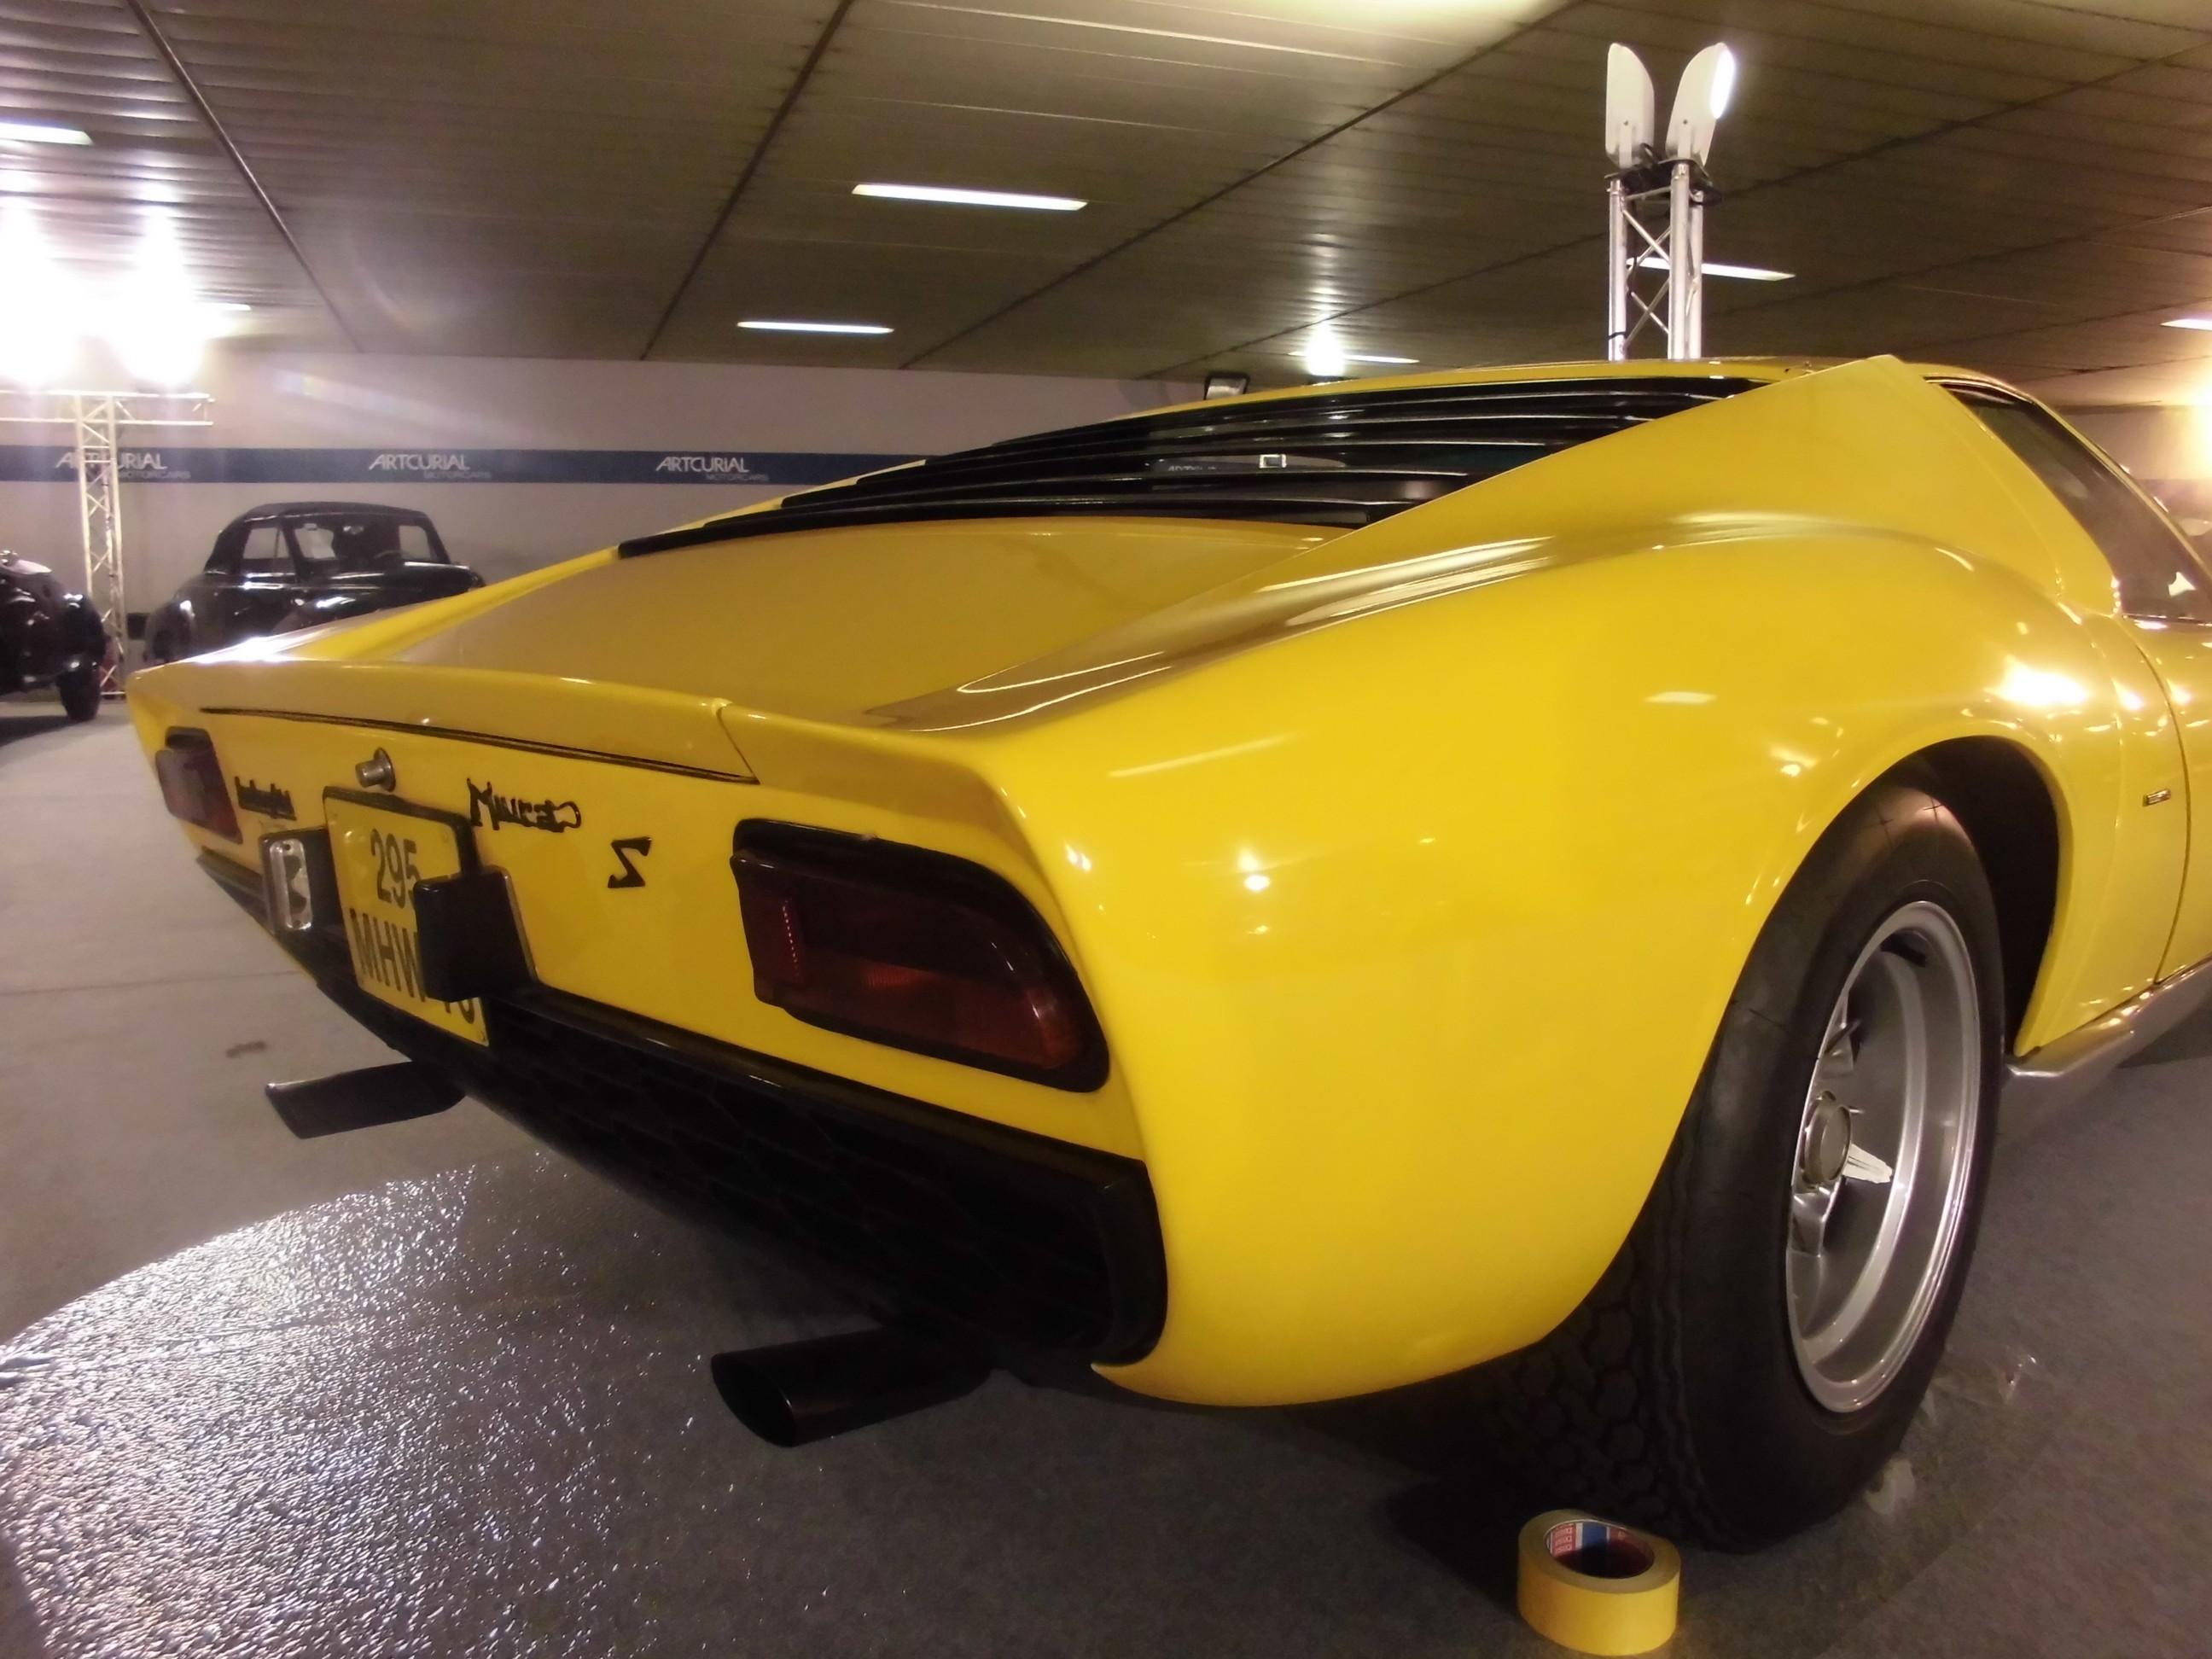 d2cc63fb94 Wonderful Lamborghini Countach Strohm De Rella Cars Trend